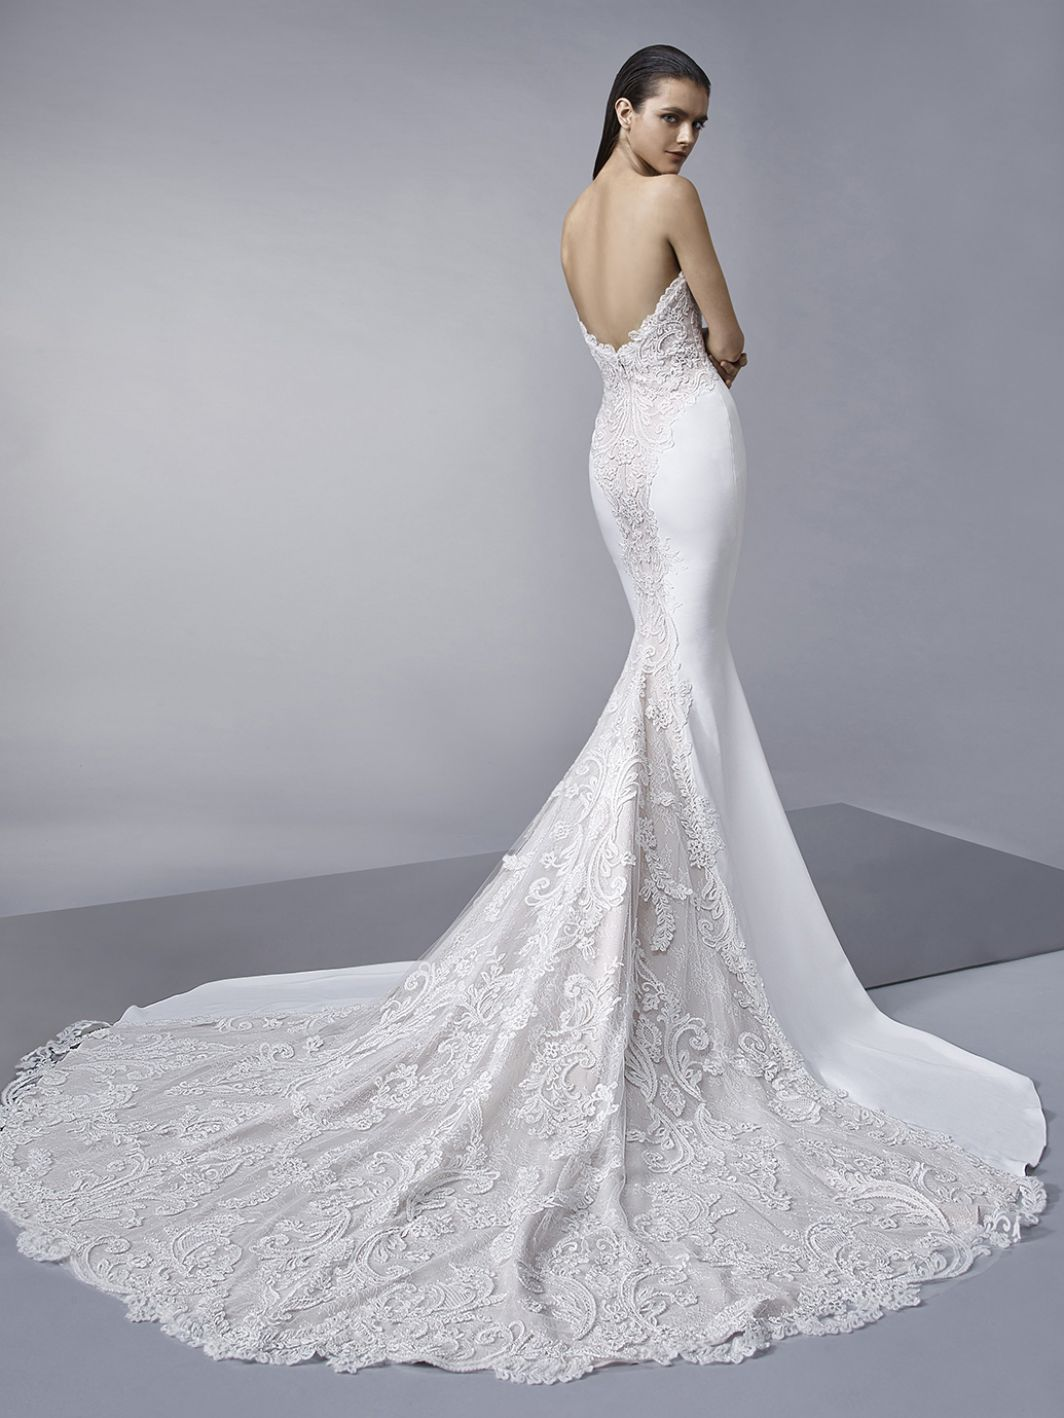 beach type wedding dresses photo - 1